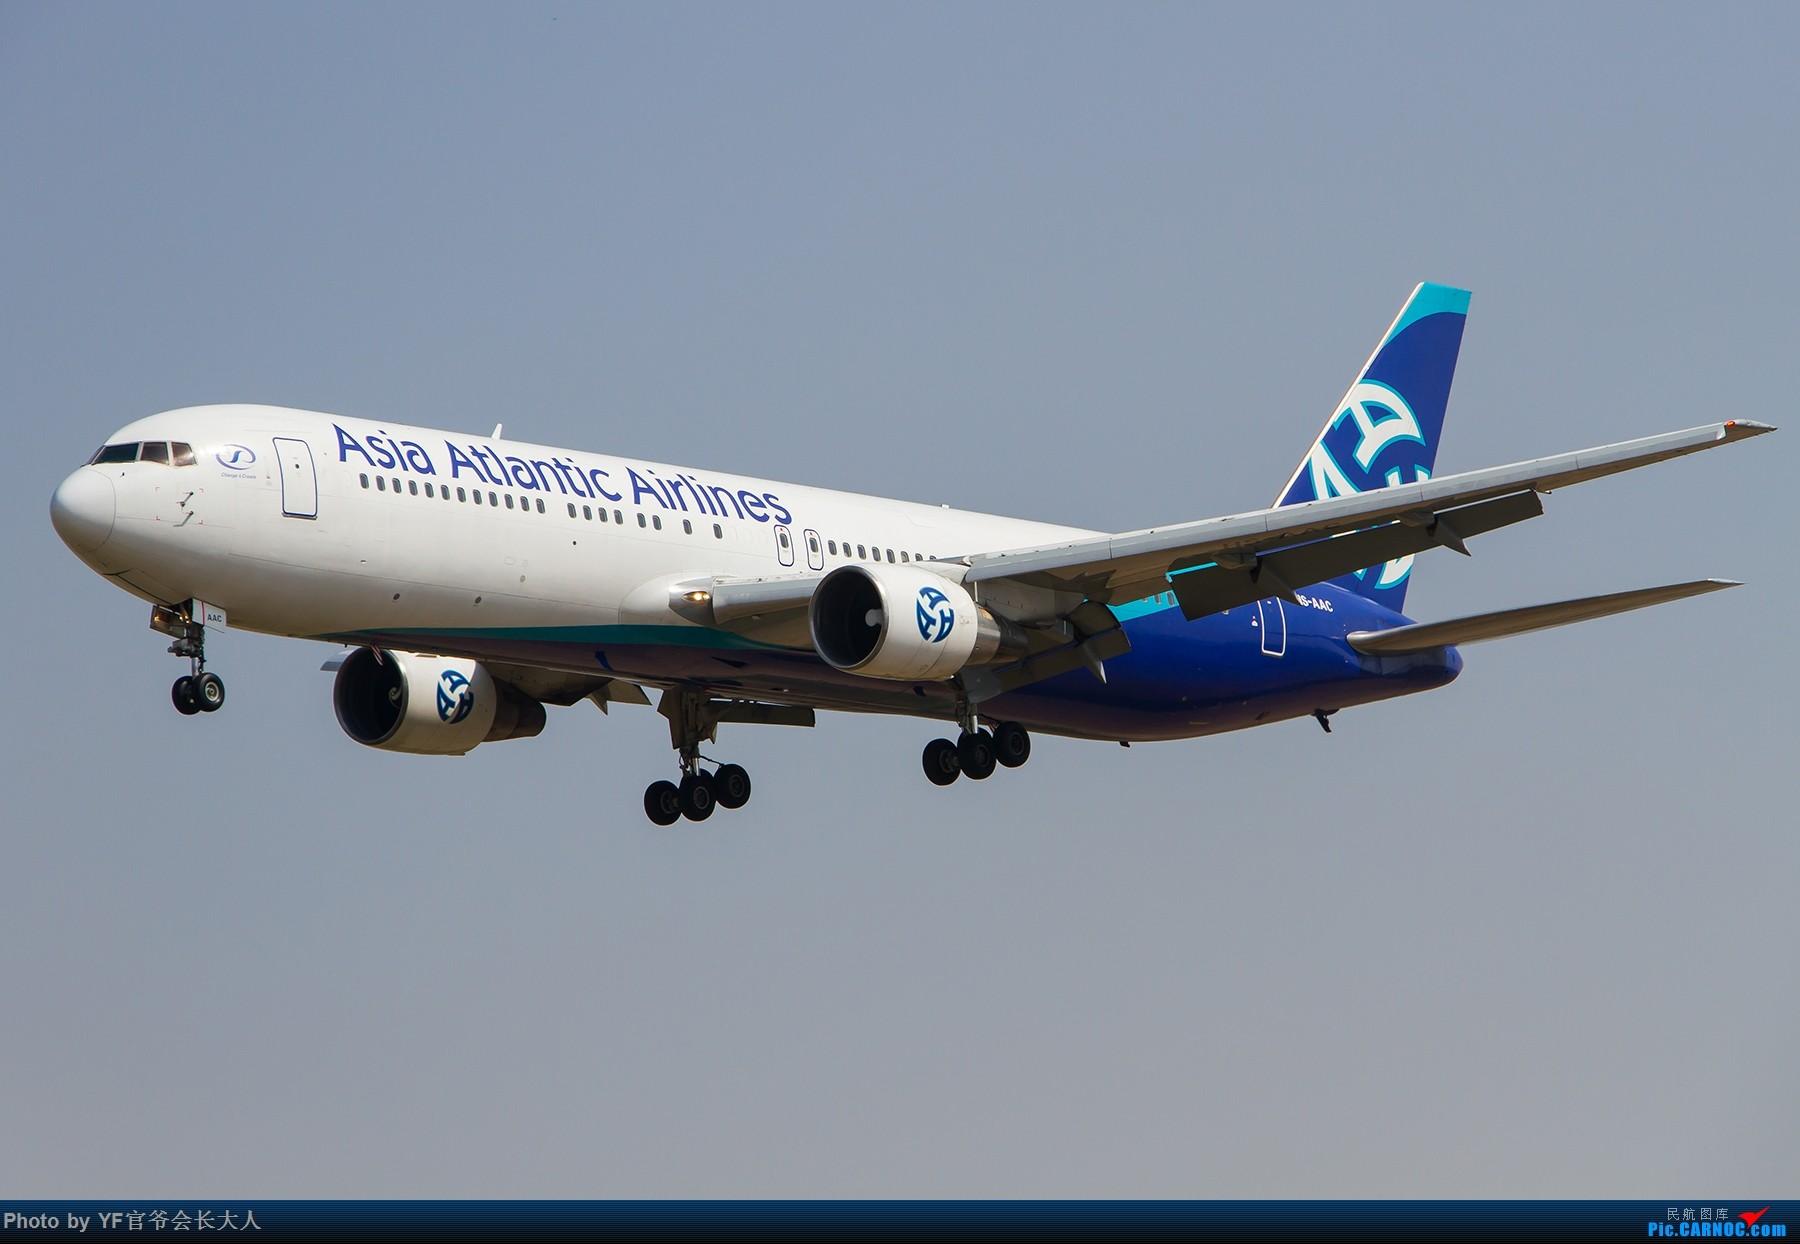 Re:[原创]【ZYTX】轻易不拍机,拍就要拍个过瘾!(新开的酷鸟,亚洲大西洋,顺带碰上朝韩两国的好货) BOEING 767-300ER HS-AAC 中国沈阳桃仙国际机场